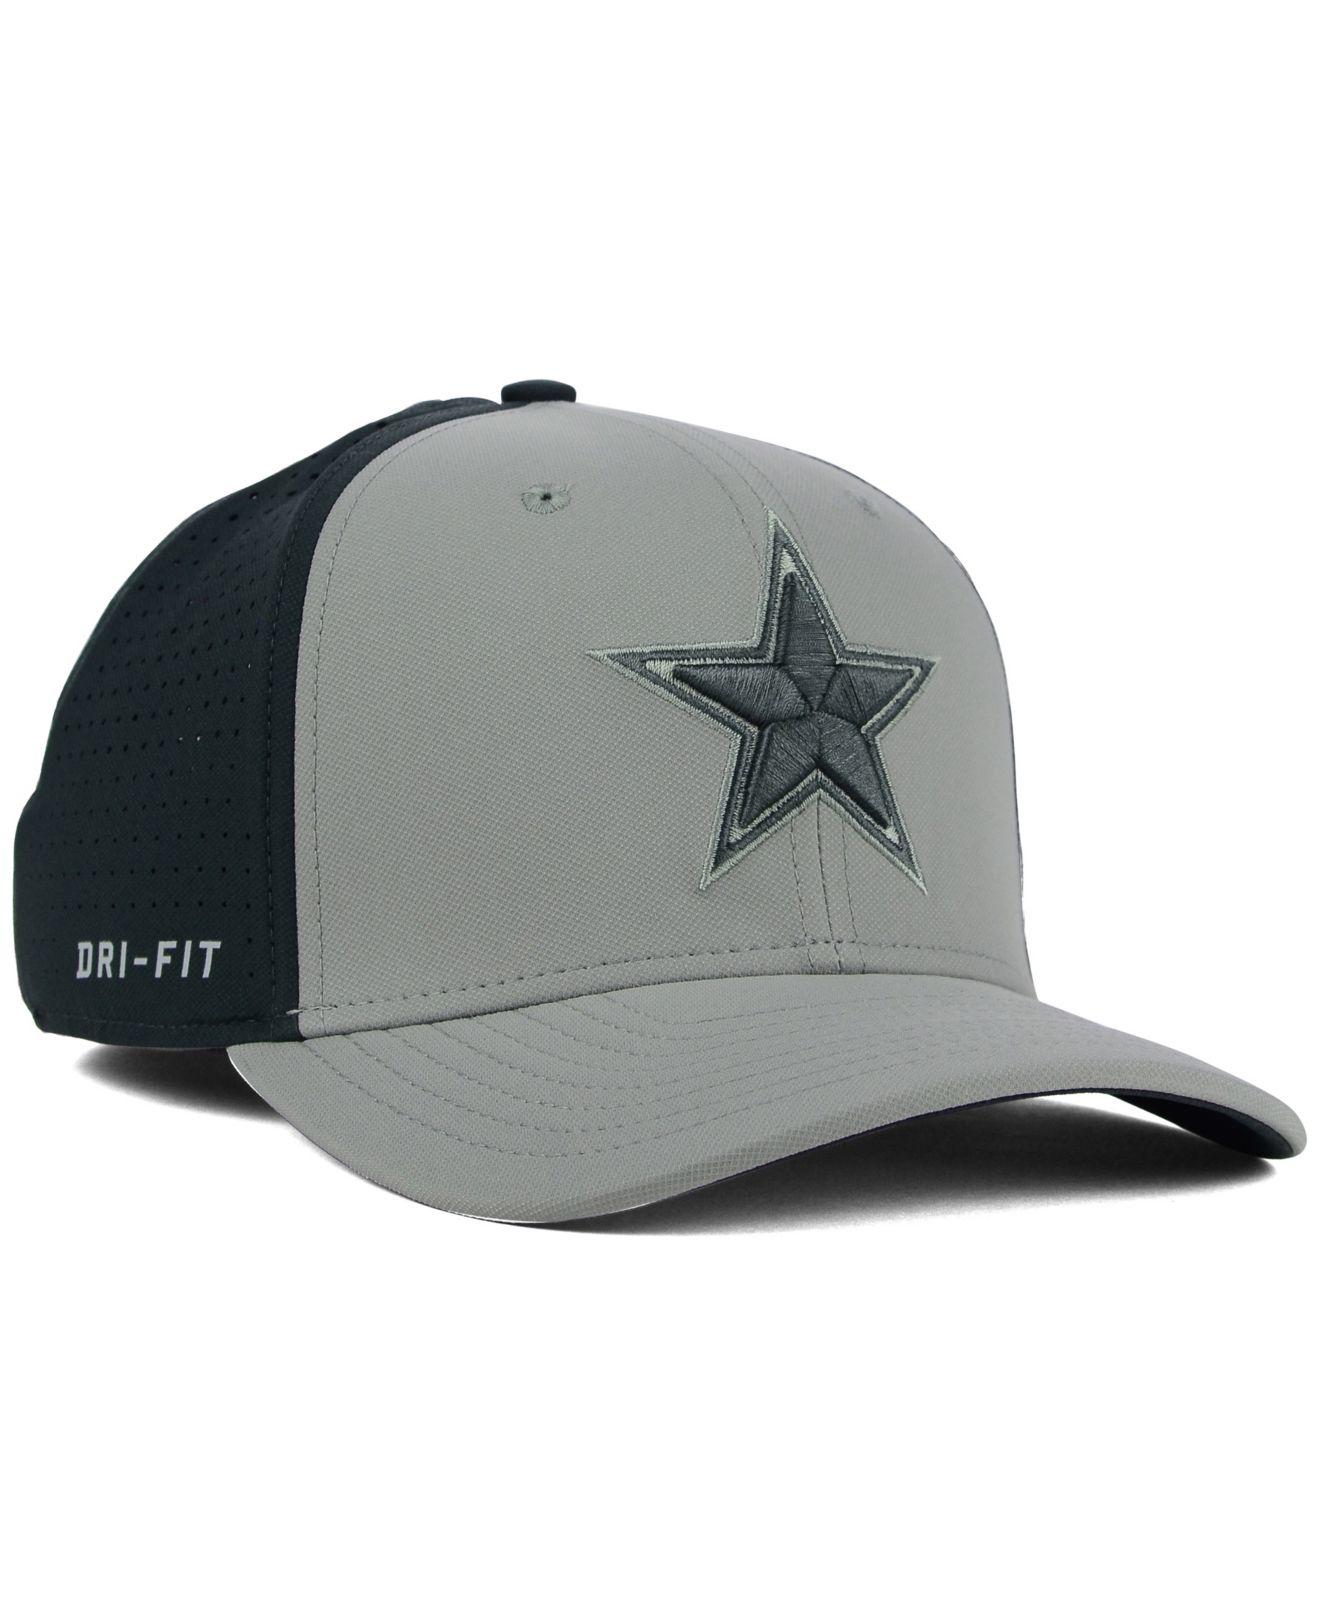 0c6d35d5c where to buy dallas cowboys nike cap 8868f 93b49